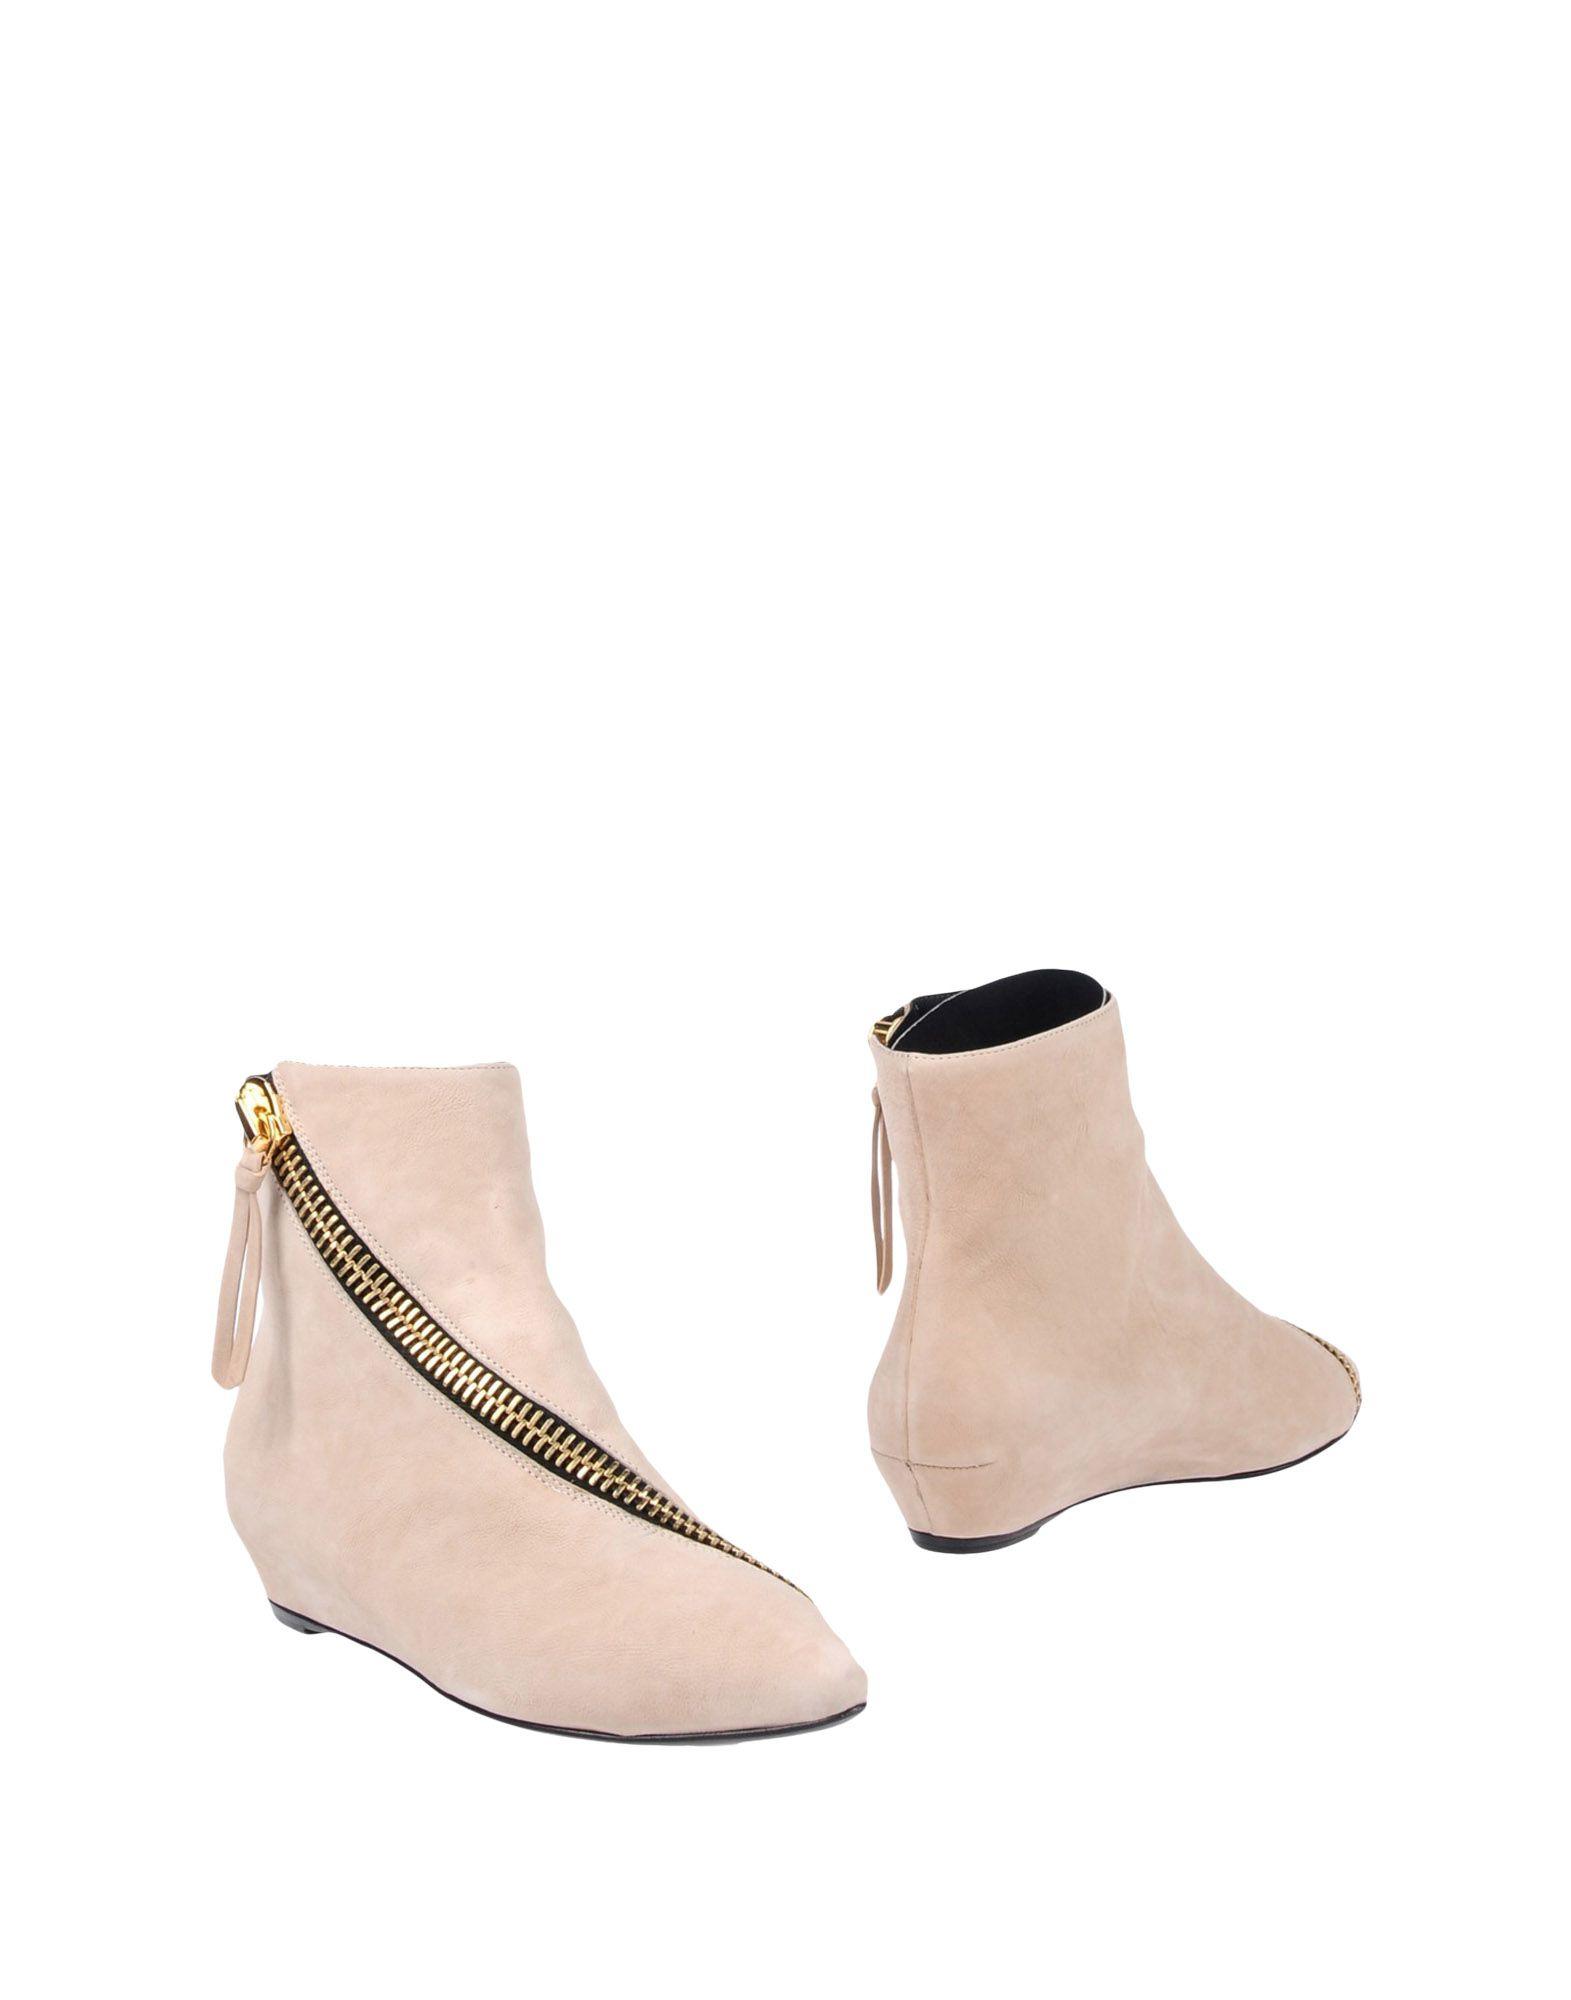 Giuseppe Zanotti Stiefelette Damen  11413936KI 11413936KI  Neue Schuhe eb8379